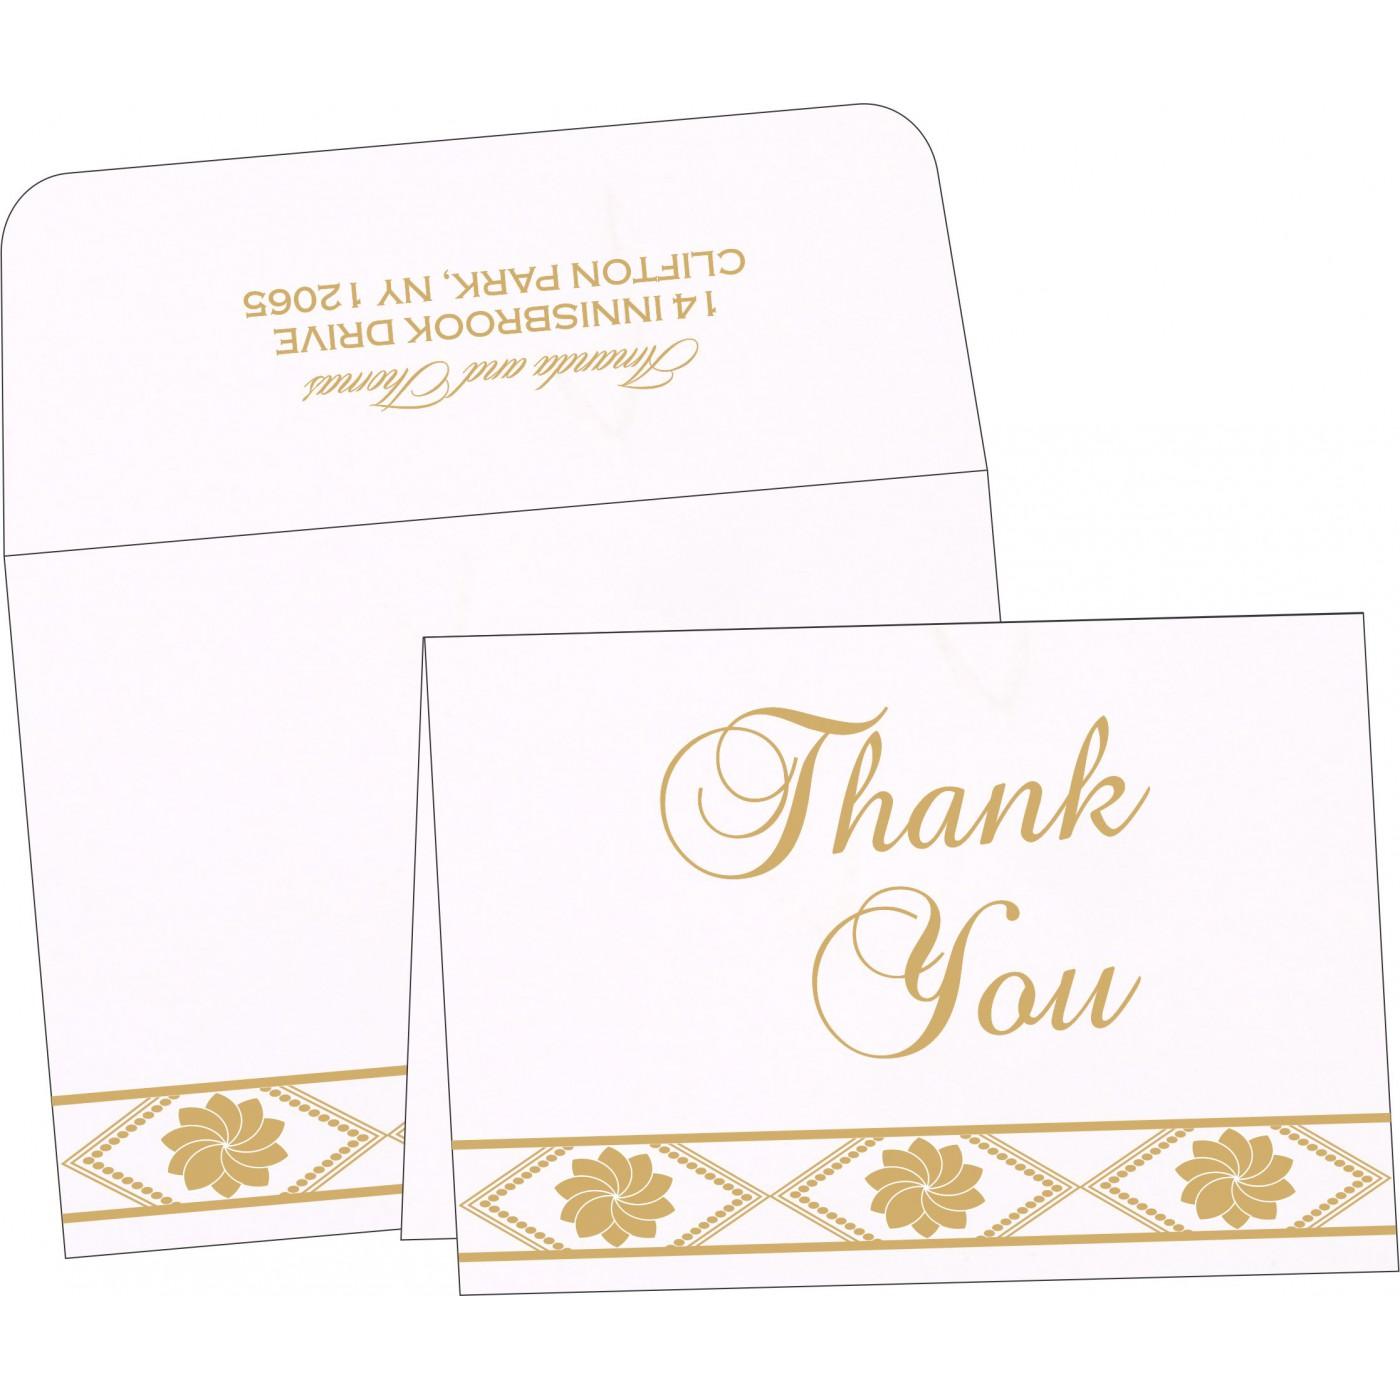 Thank You Cards : TYC-1228 - 123WeddingCards